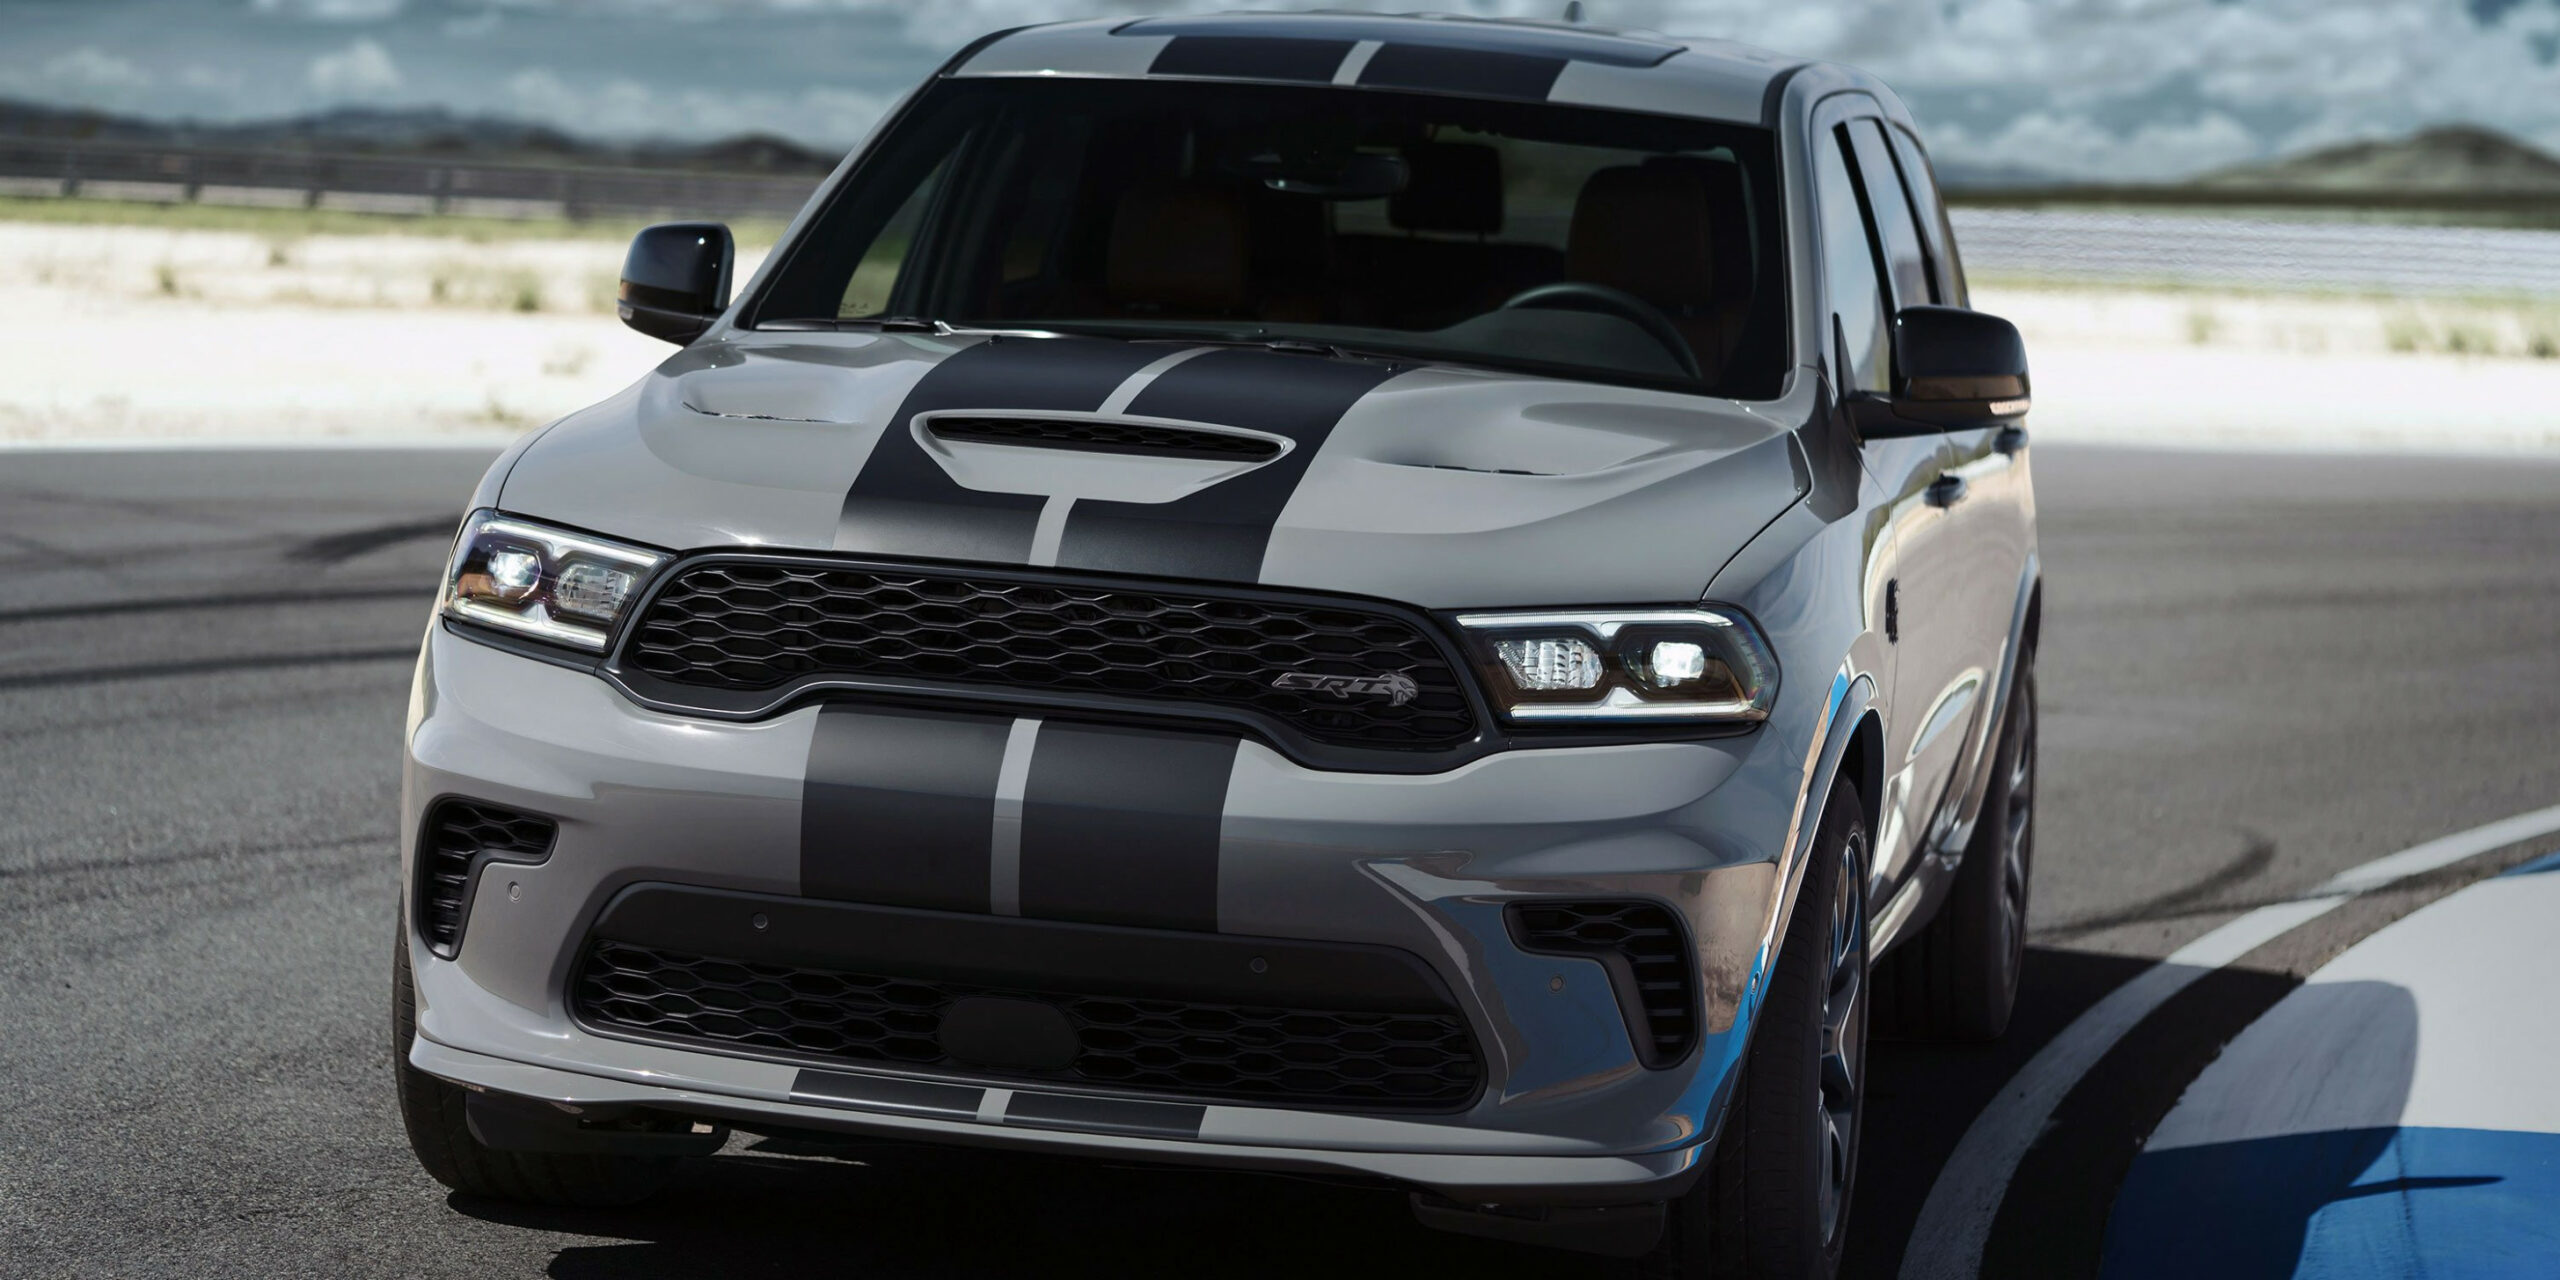 Exterior Dodge Supercharger 2022